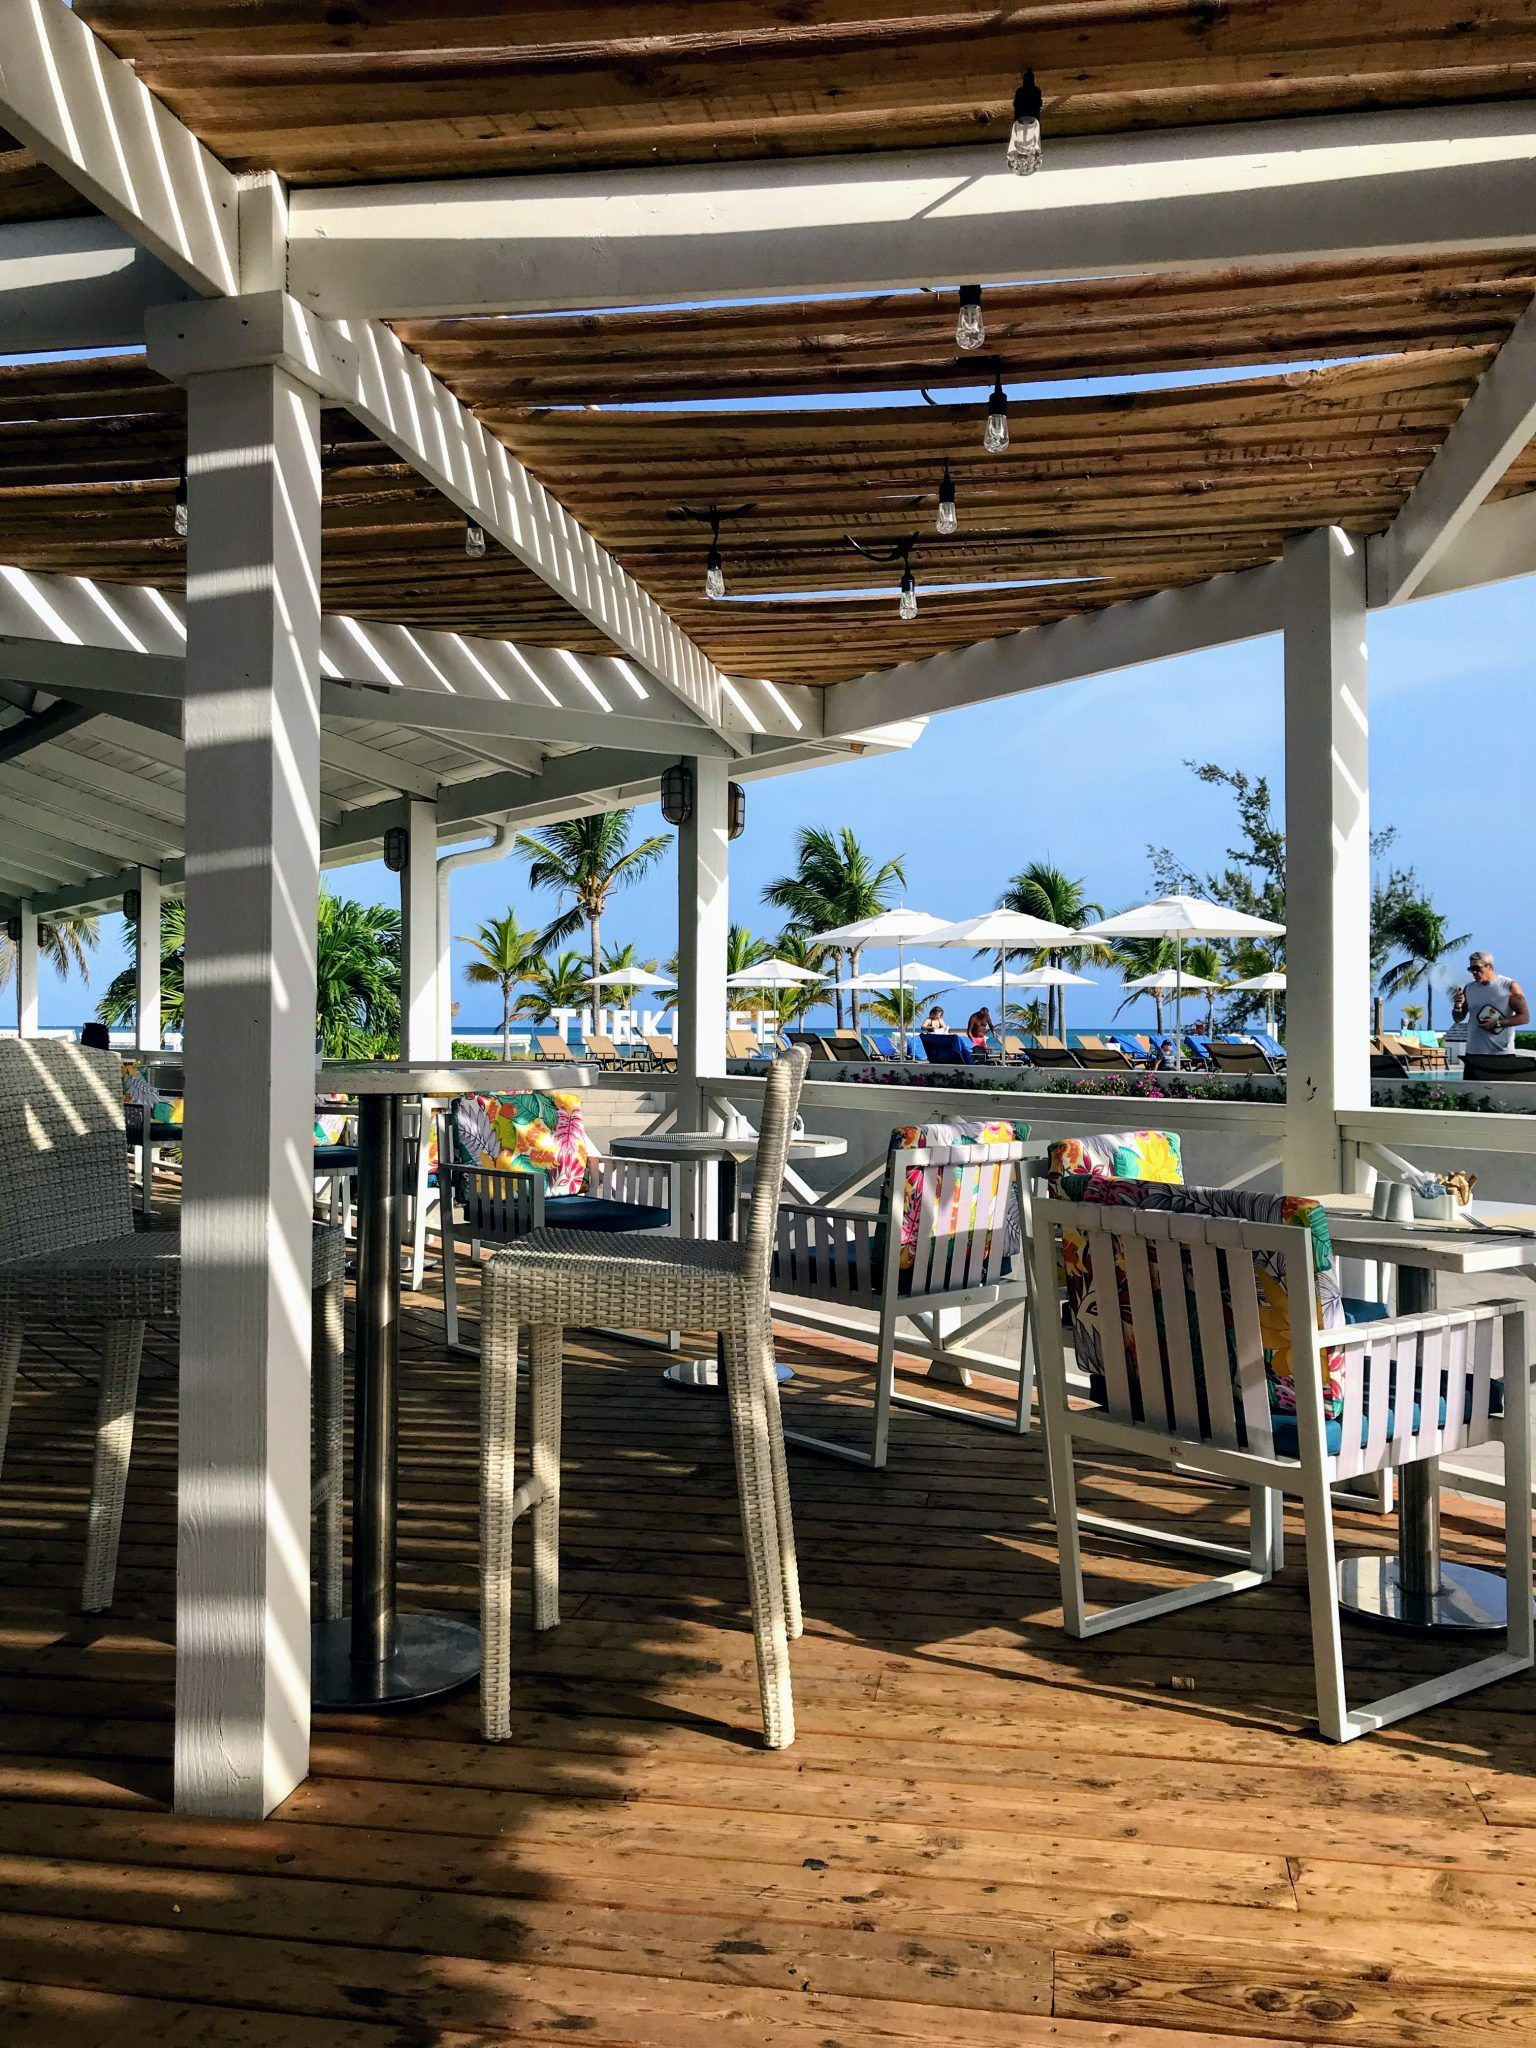 Turks, Caicos Resorts, Vacation